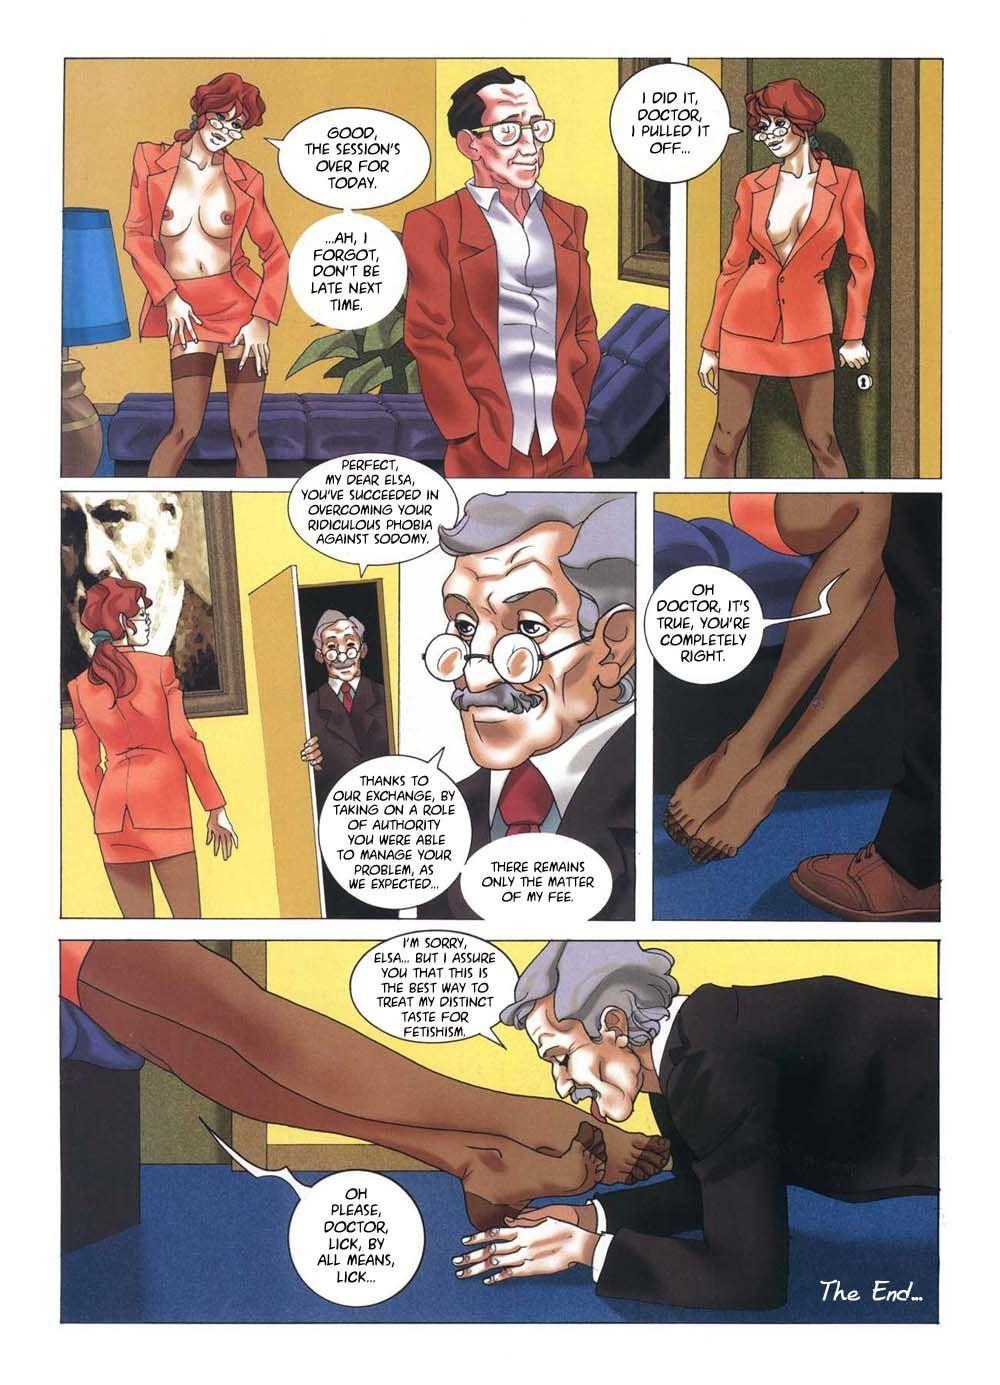 Fildor The Psychoanalyst